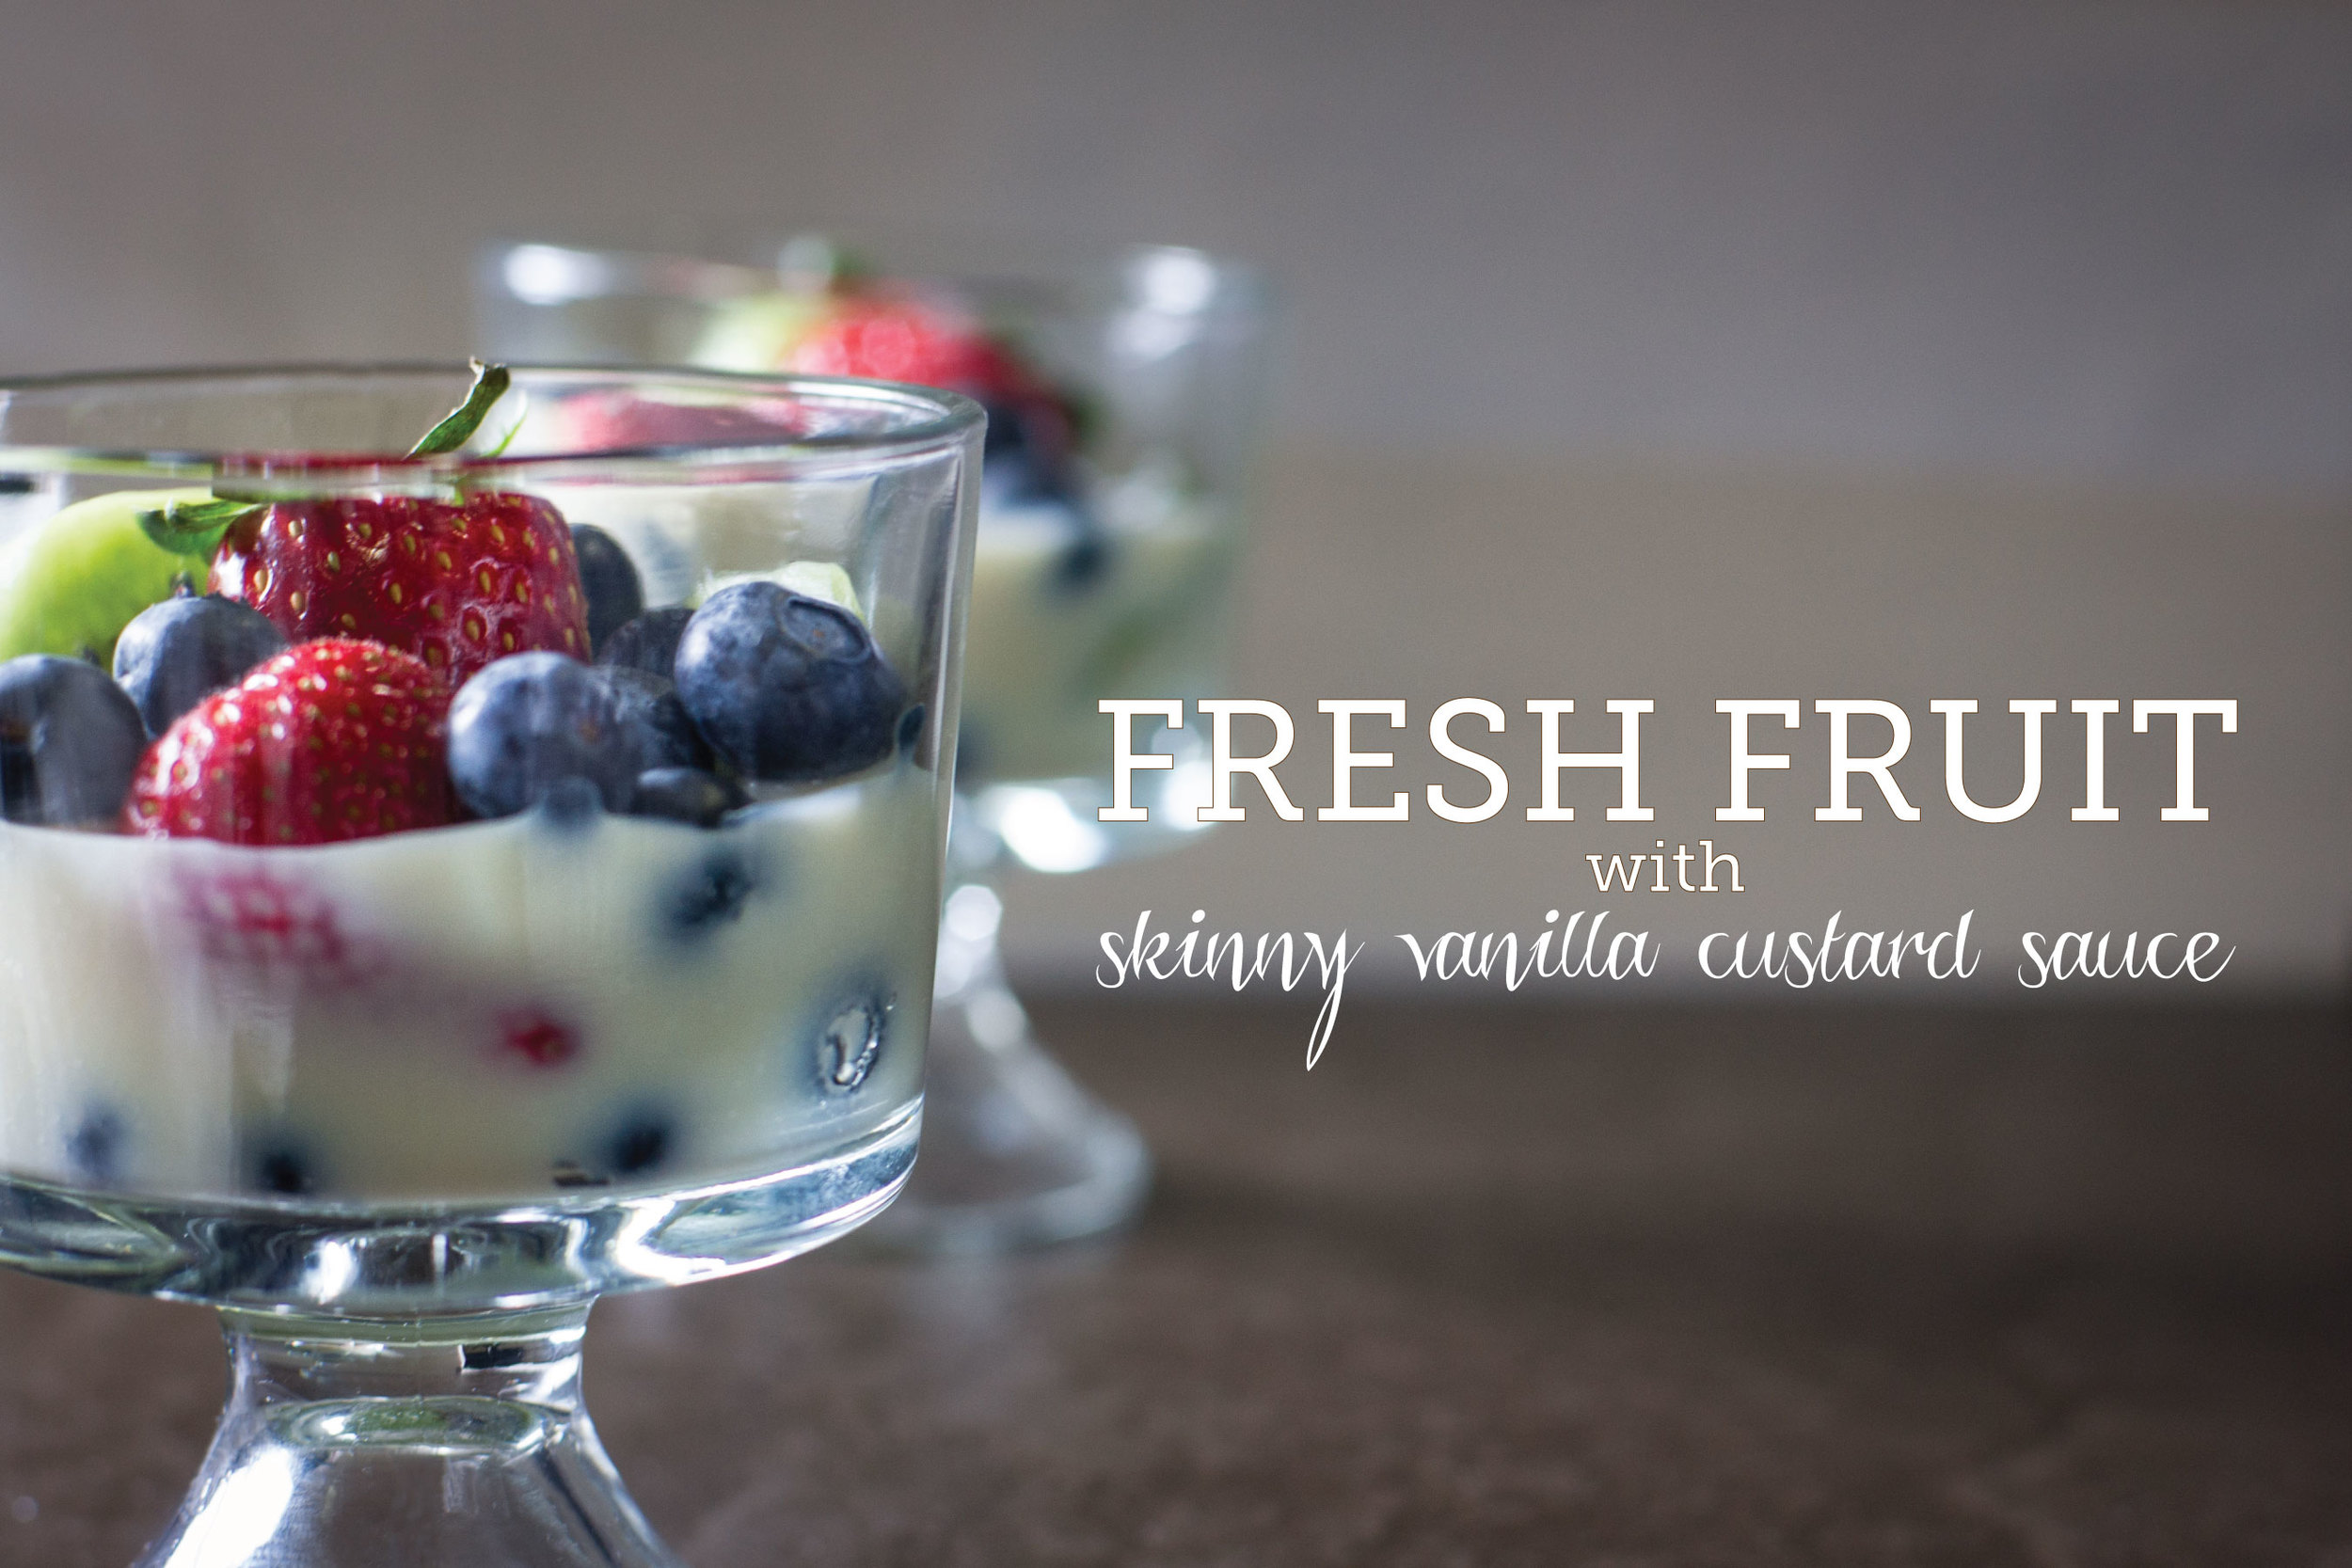 Fresh Fruit with Skinny Vanilla Custard Sauce by Sam Henderson of Today's Nest